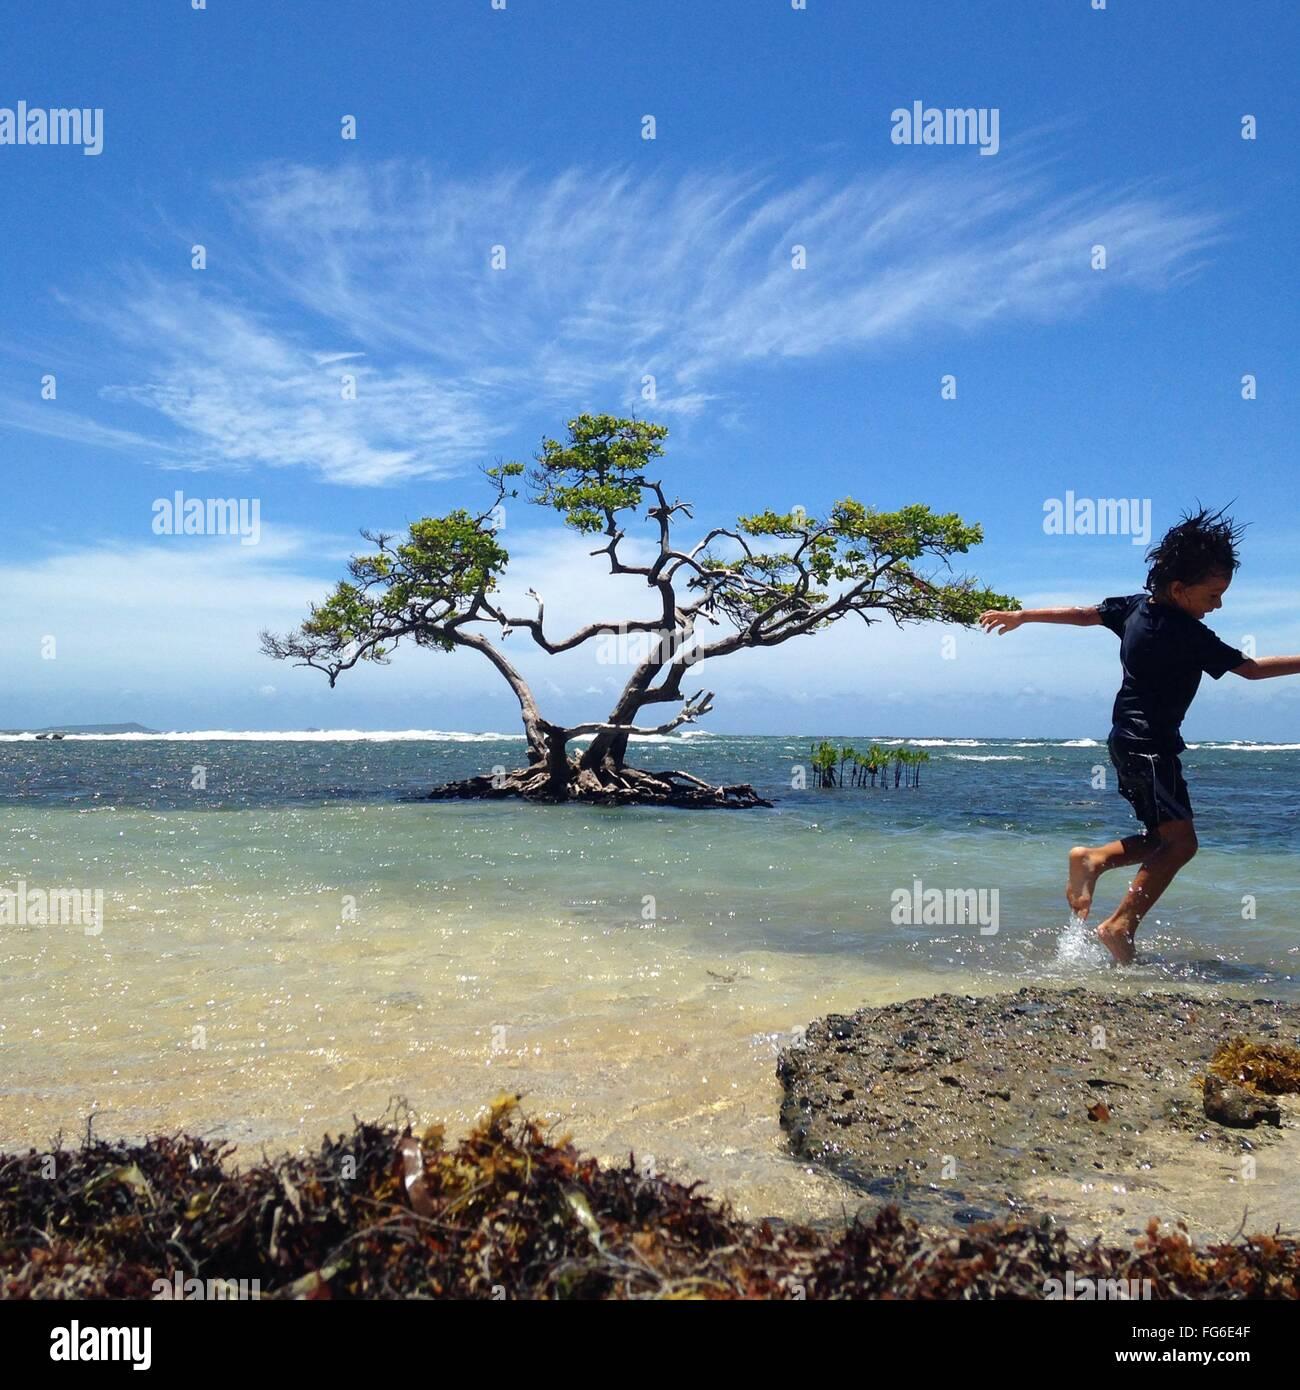 Nassen verspielt Boy am Strand gegen Himmel Stockbild